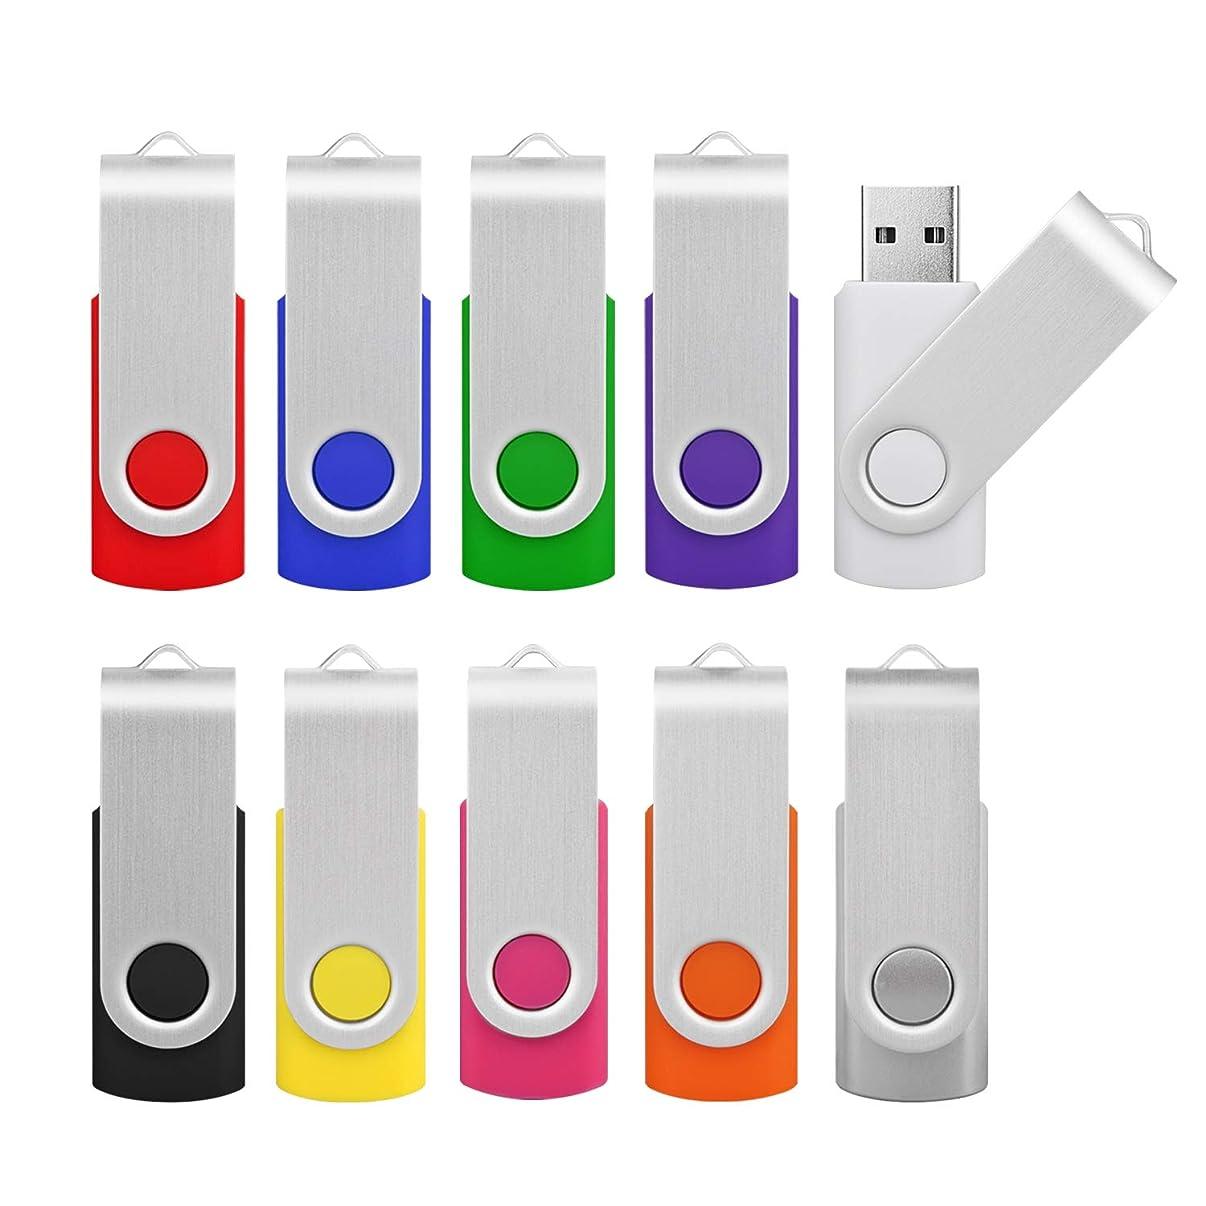 Kootion 16GB Flash Drive 16gb USB Flash Drive 10 Pack Thumb Drive Memory Stick Swivel Jump Drive Keychain Design, Mixcolored